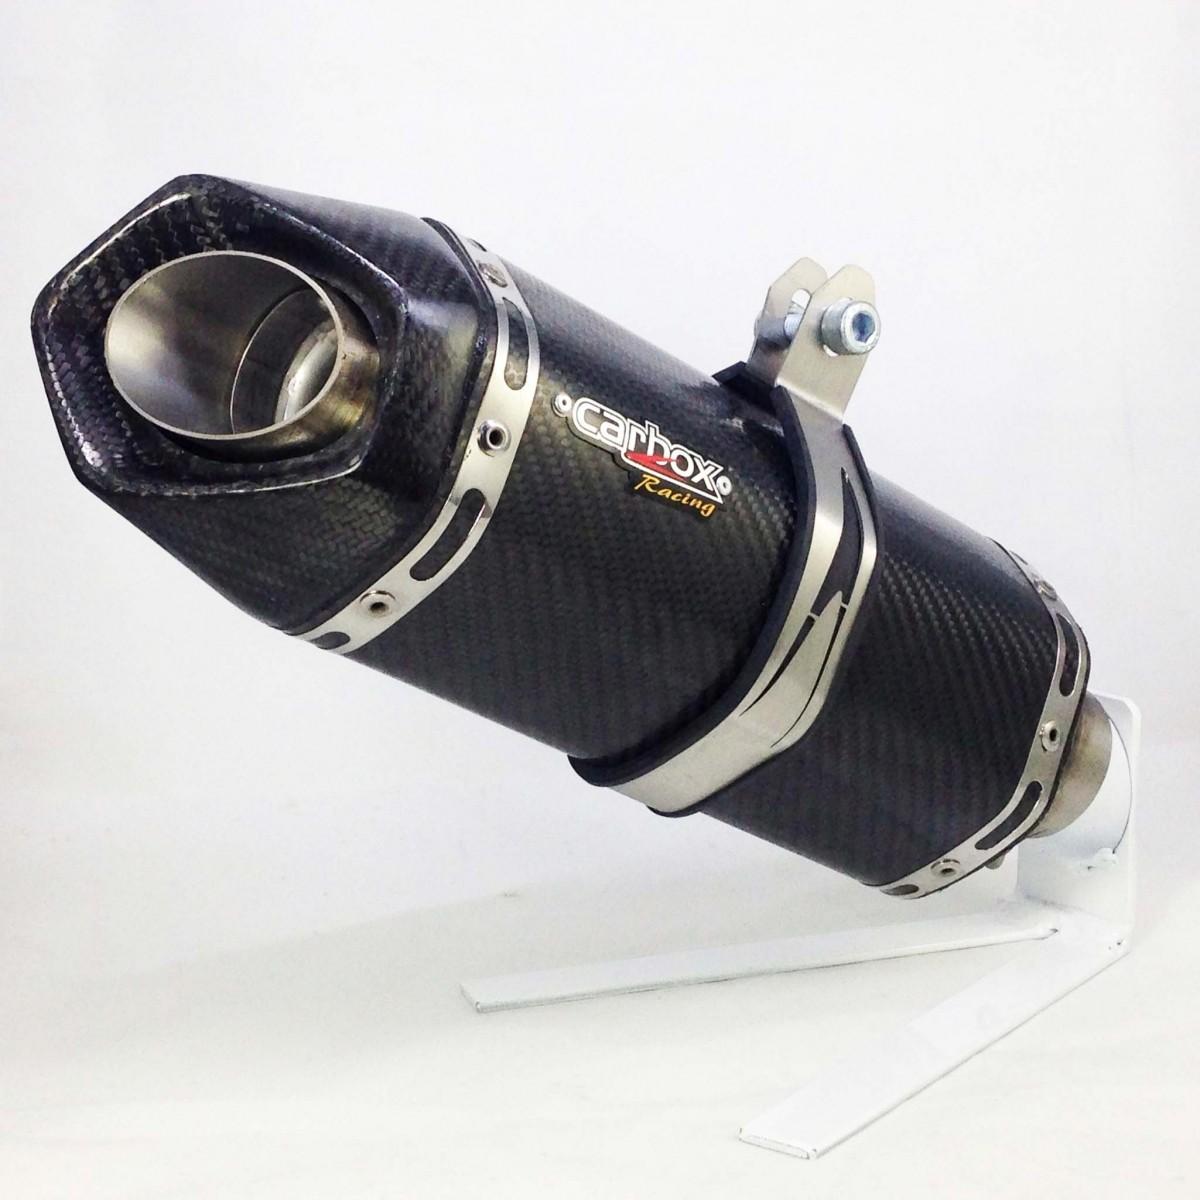 Ponteira Esportiva Shark S920 Carbon p/ Suzuki GSR 750